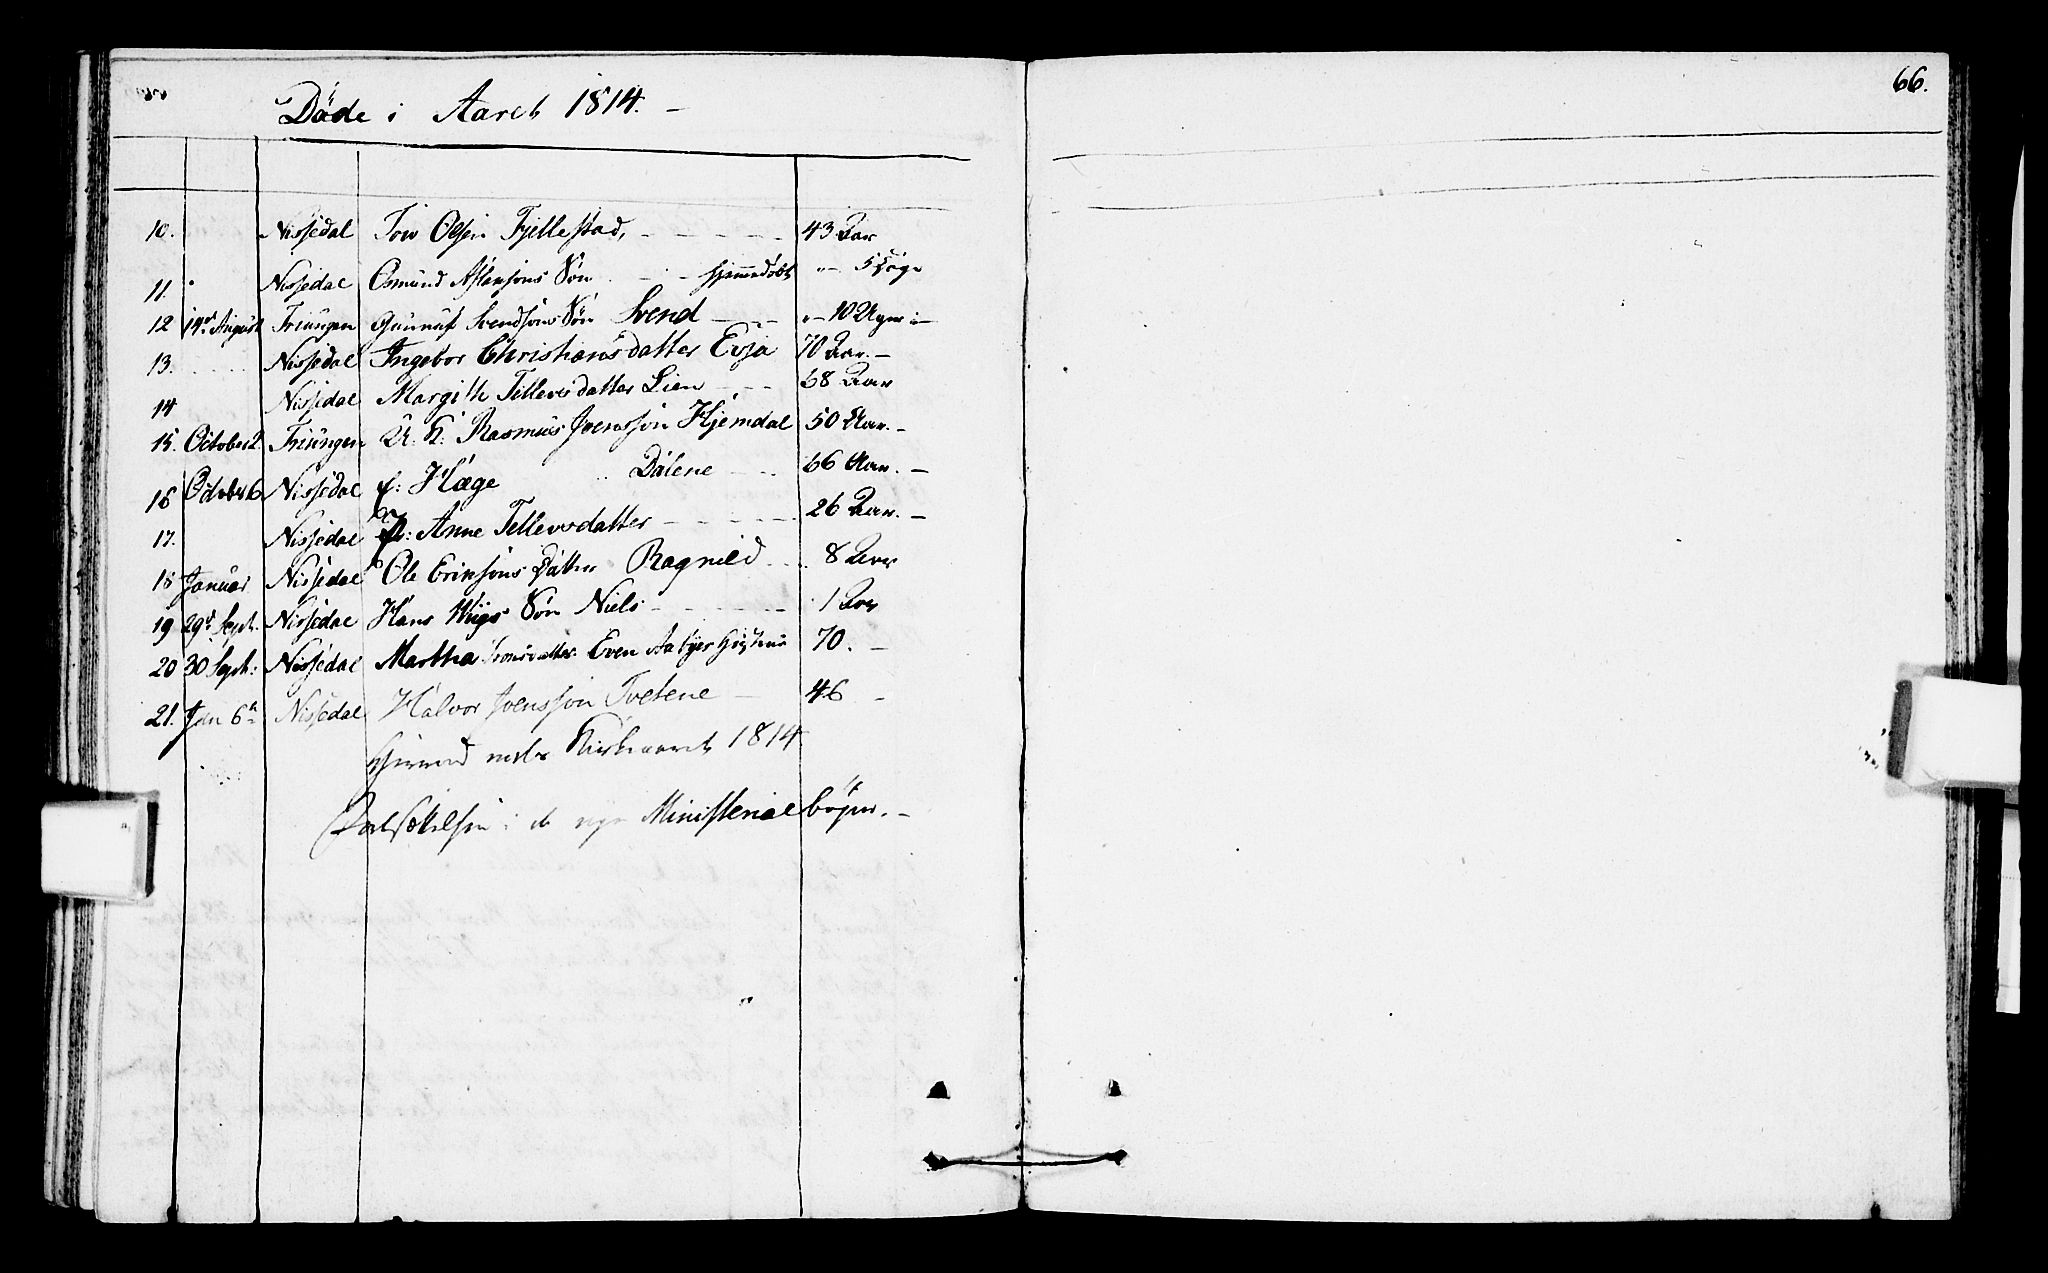 SAKO, Nissedal kirkebøker, F/Fa/L0001: Ministerialbok nr. I 1, 1811-1814, s. 66